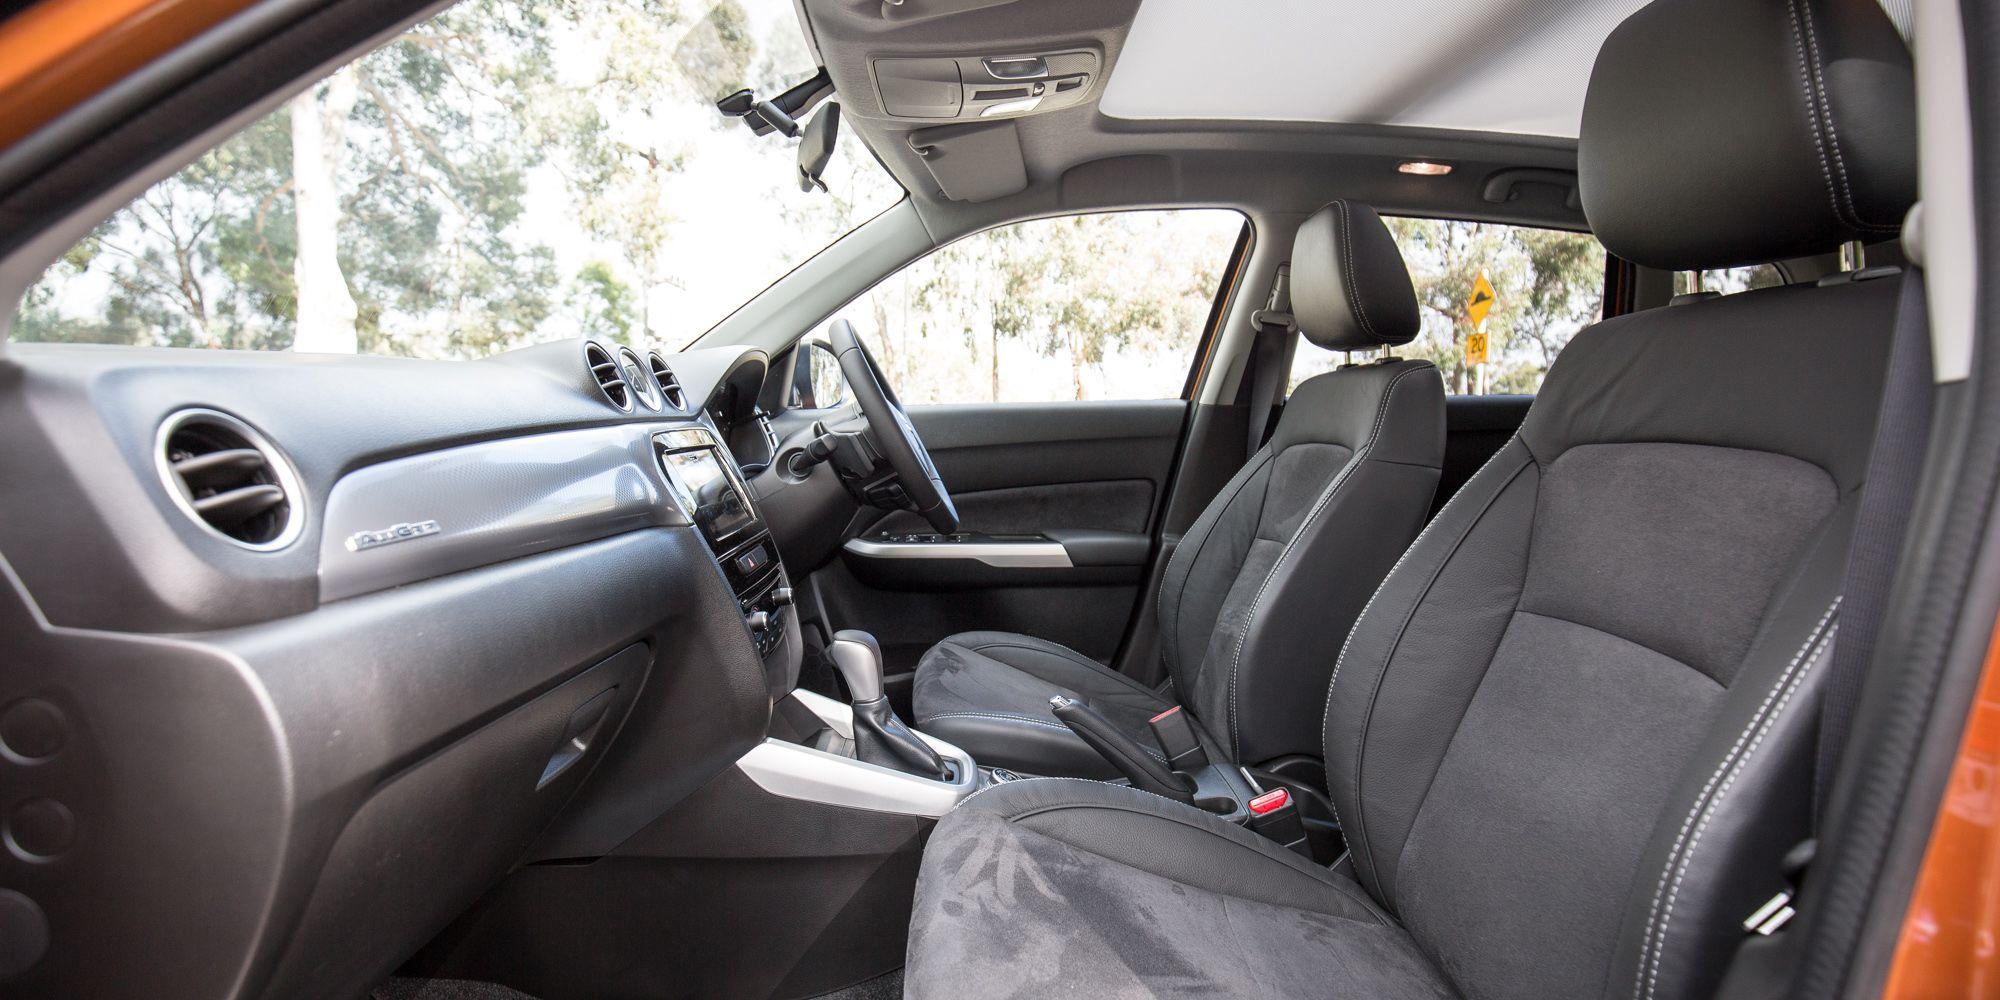 2014 suzuki grand vitara 3 door interior citroen pinterest grand vitara and cars